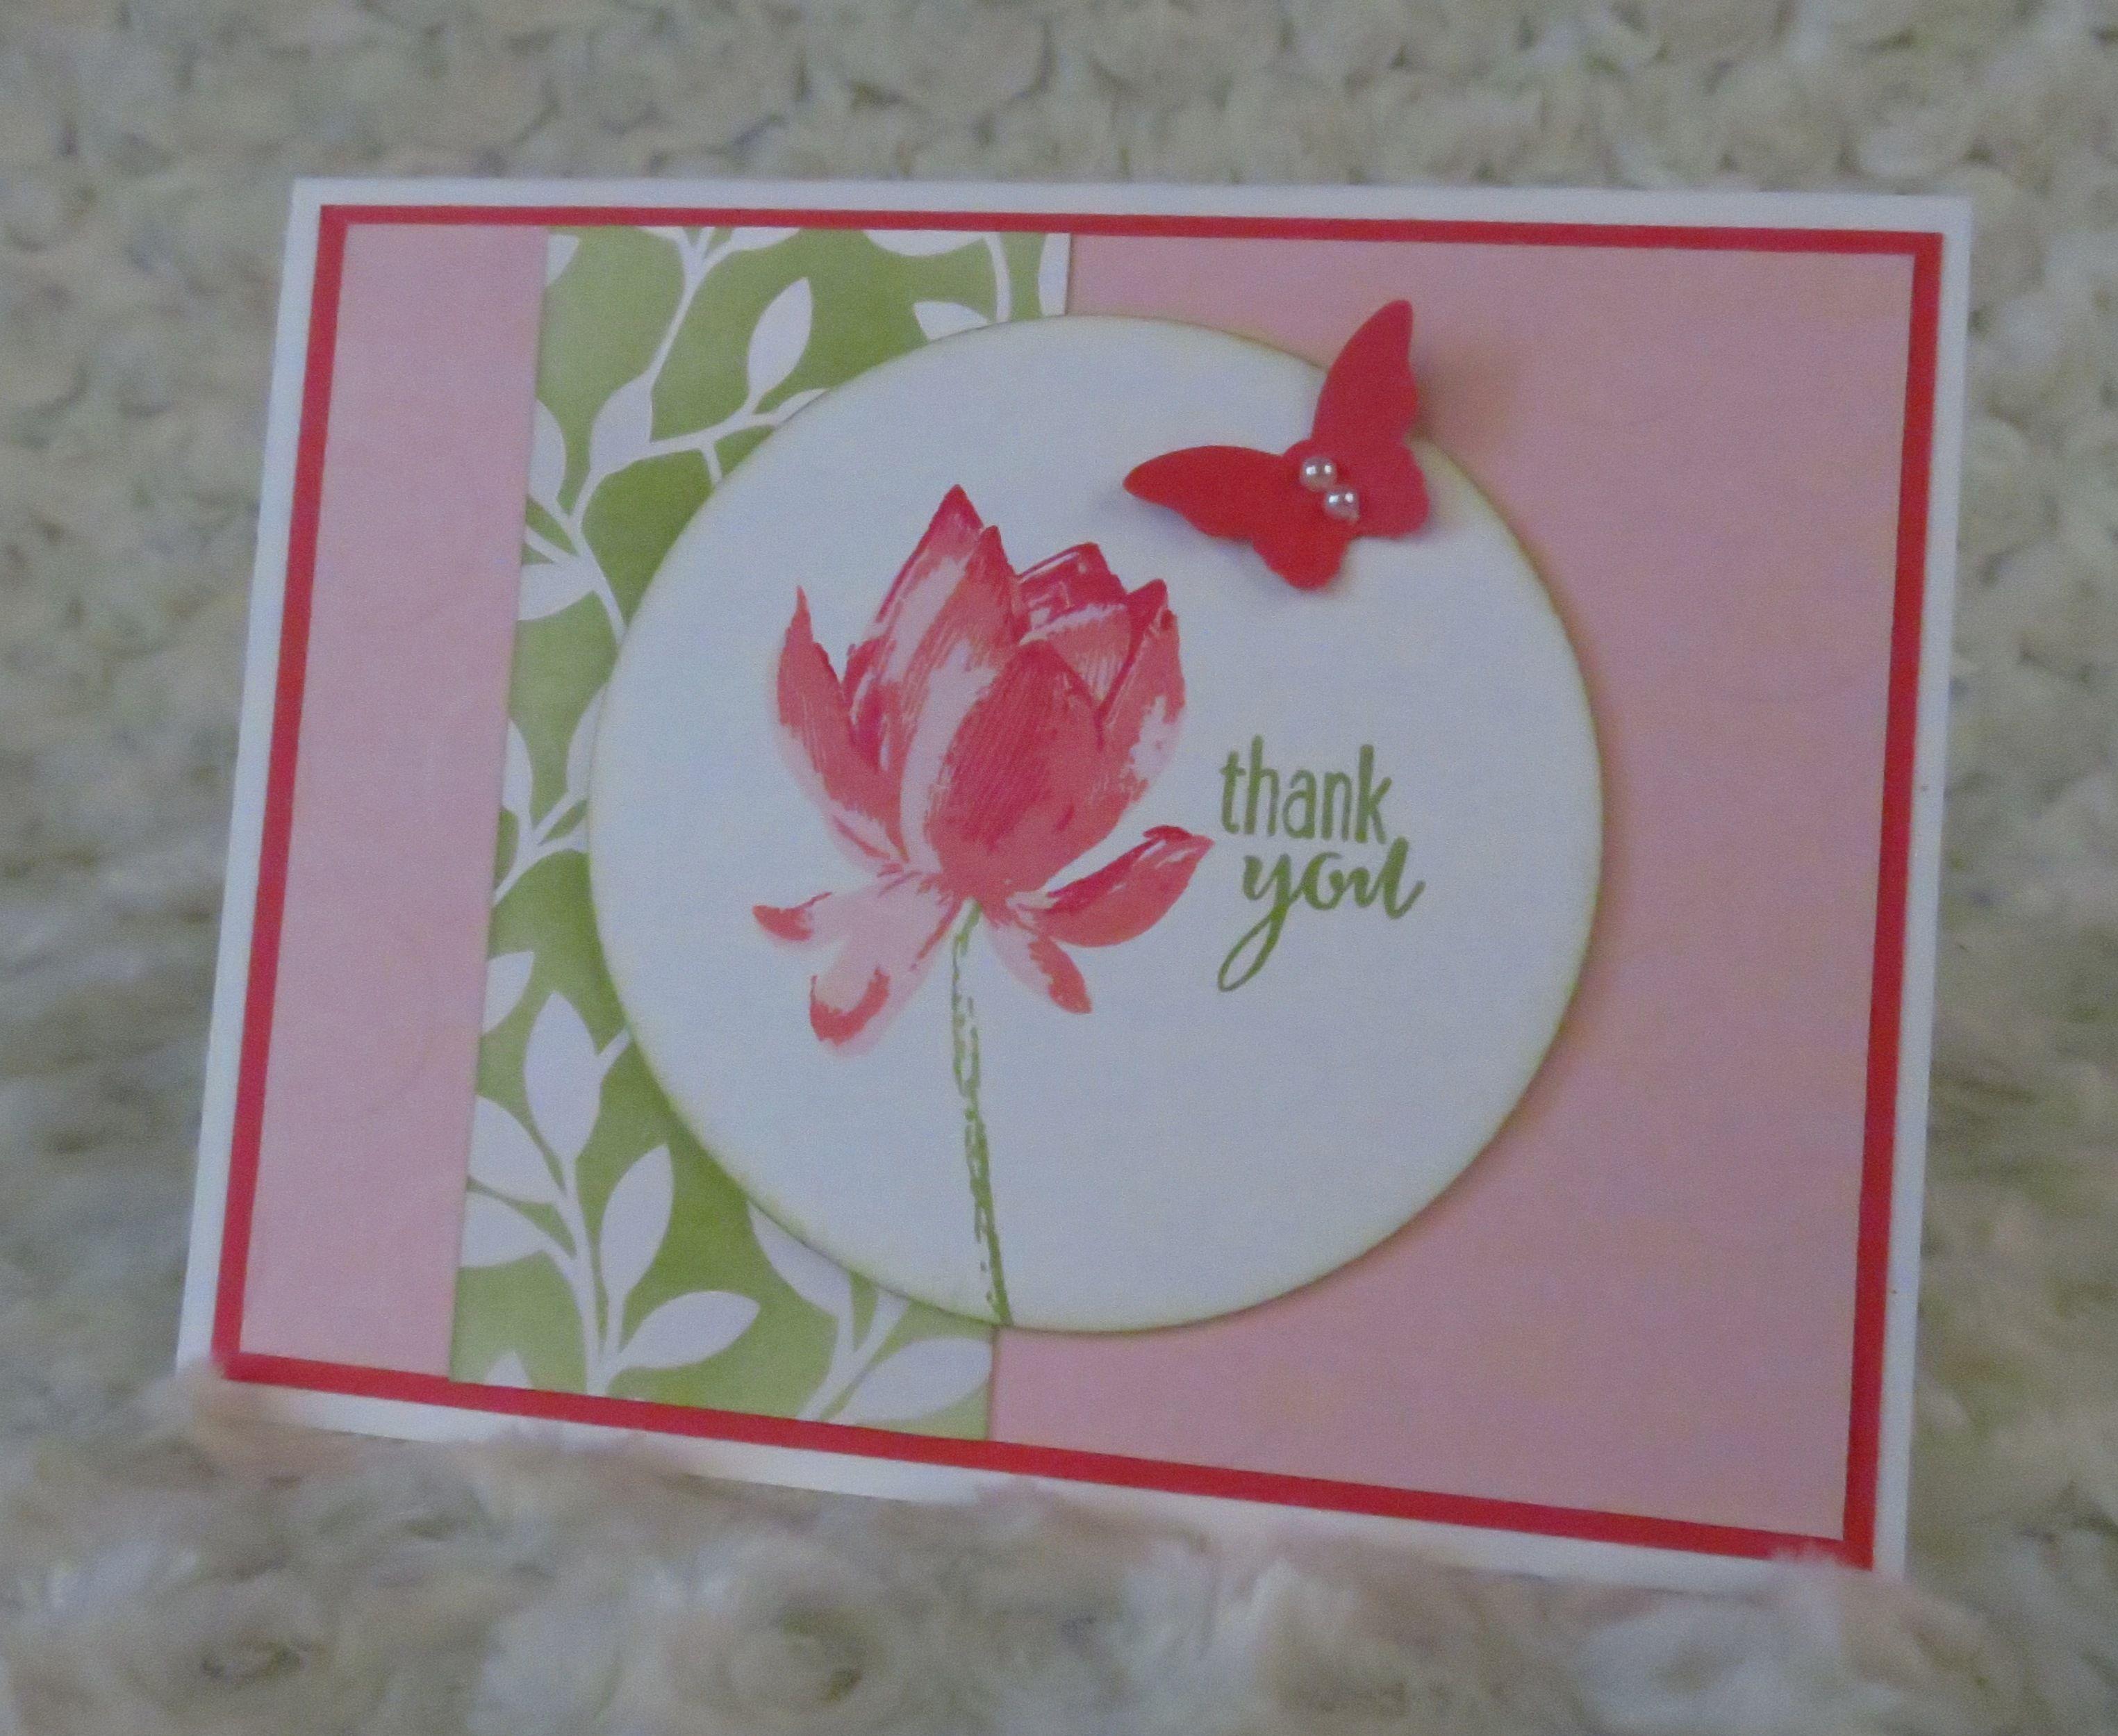 Lotus blossom- melon mambo, stamped off strawberry slush, pink pirouette.